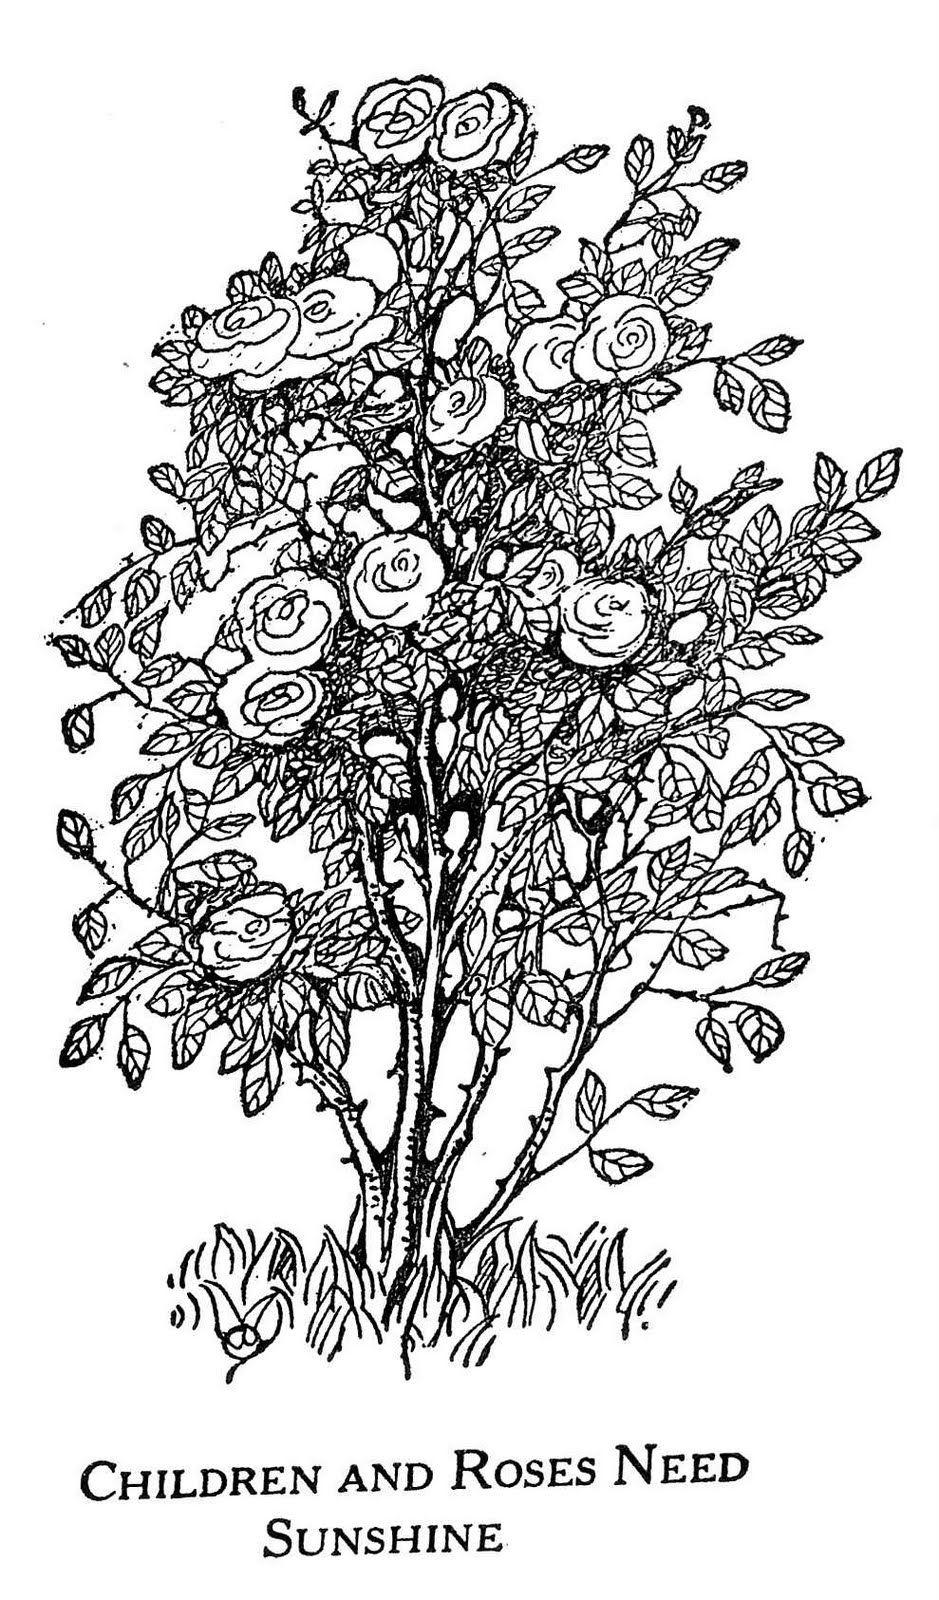 rose bush pen drawing ilustrations inspiration pinterest